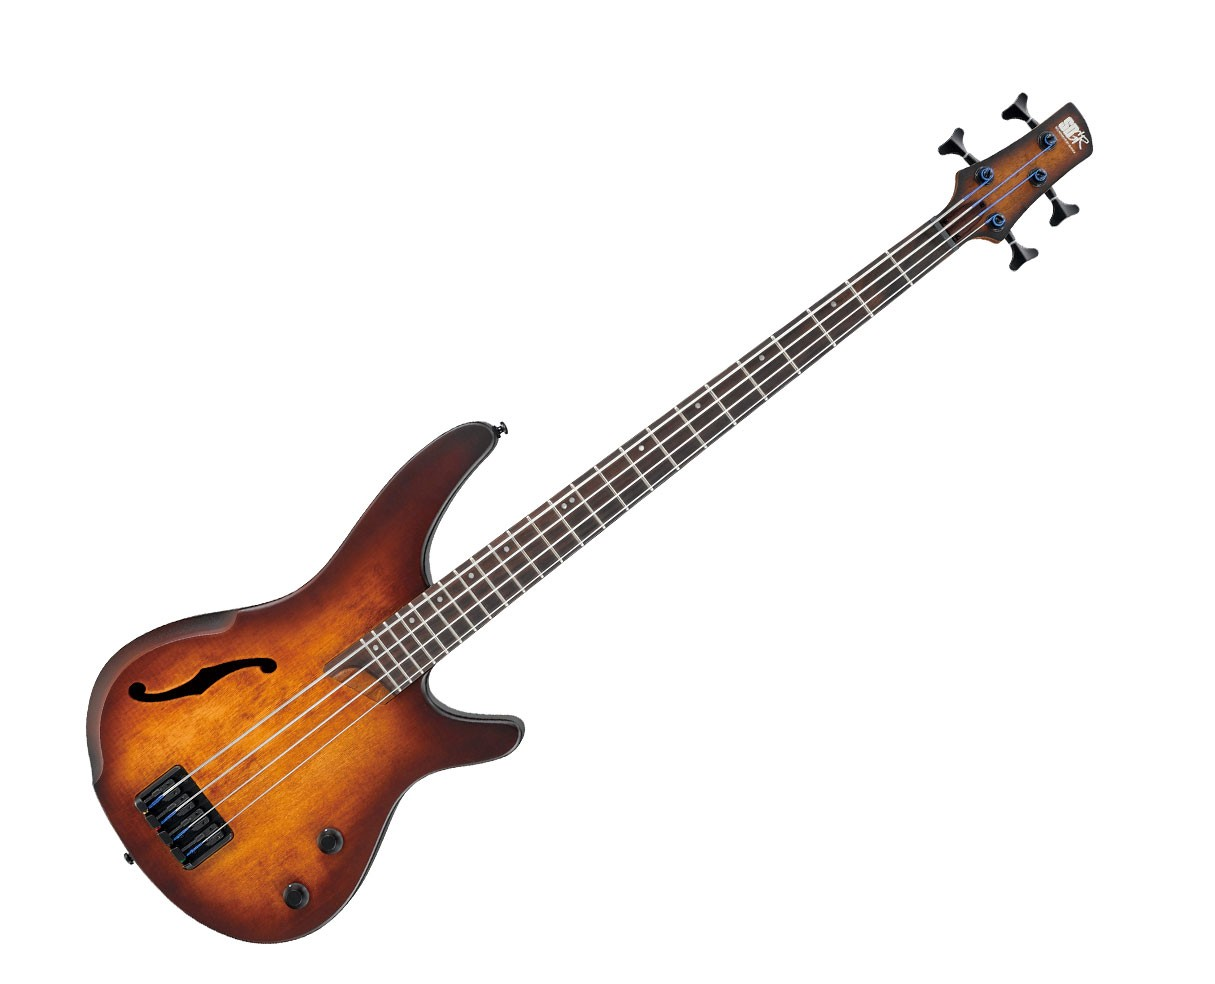 Ibanez SR Bass Workshop 4 String Electric Bass - Hollow Body - Dragon Eye Burst Flat